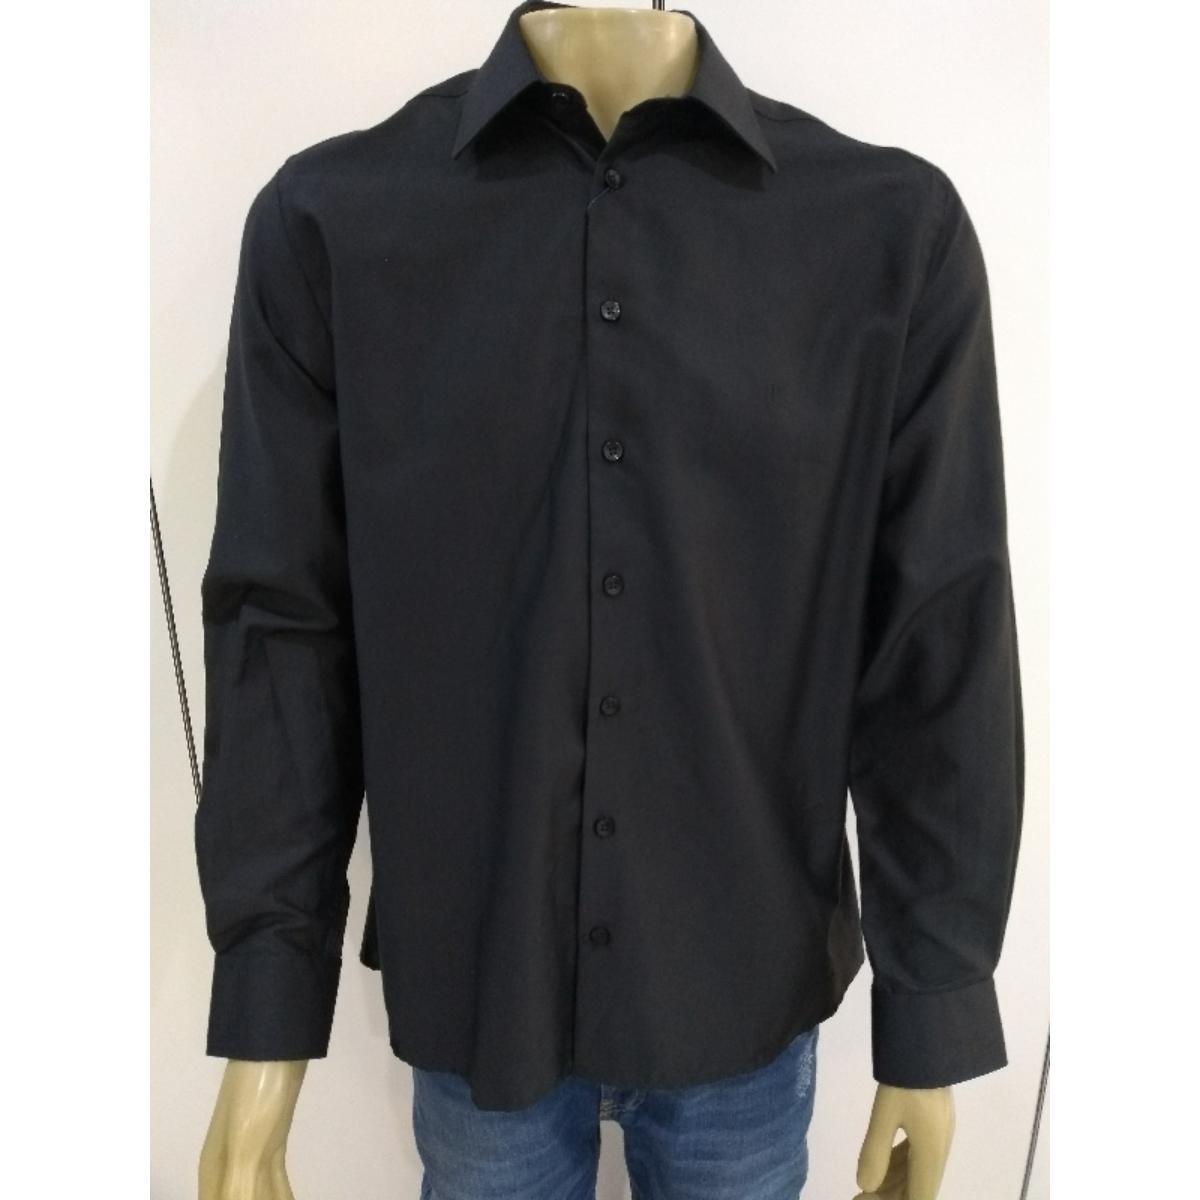 Camisa Masculina Individual 53.01.0312 02 Preto